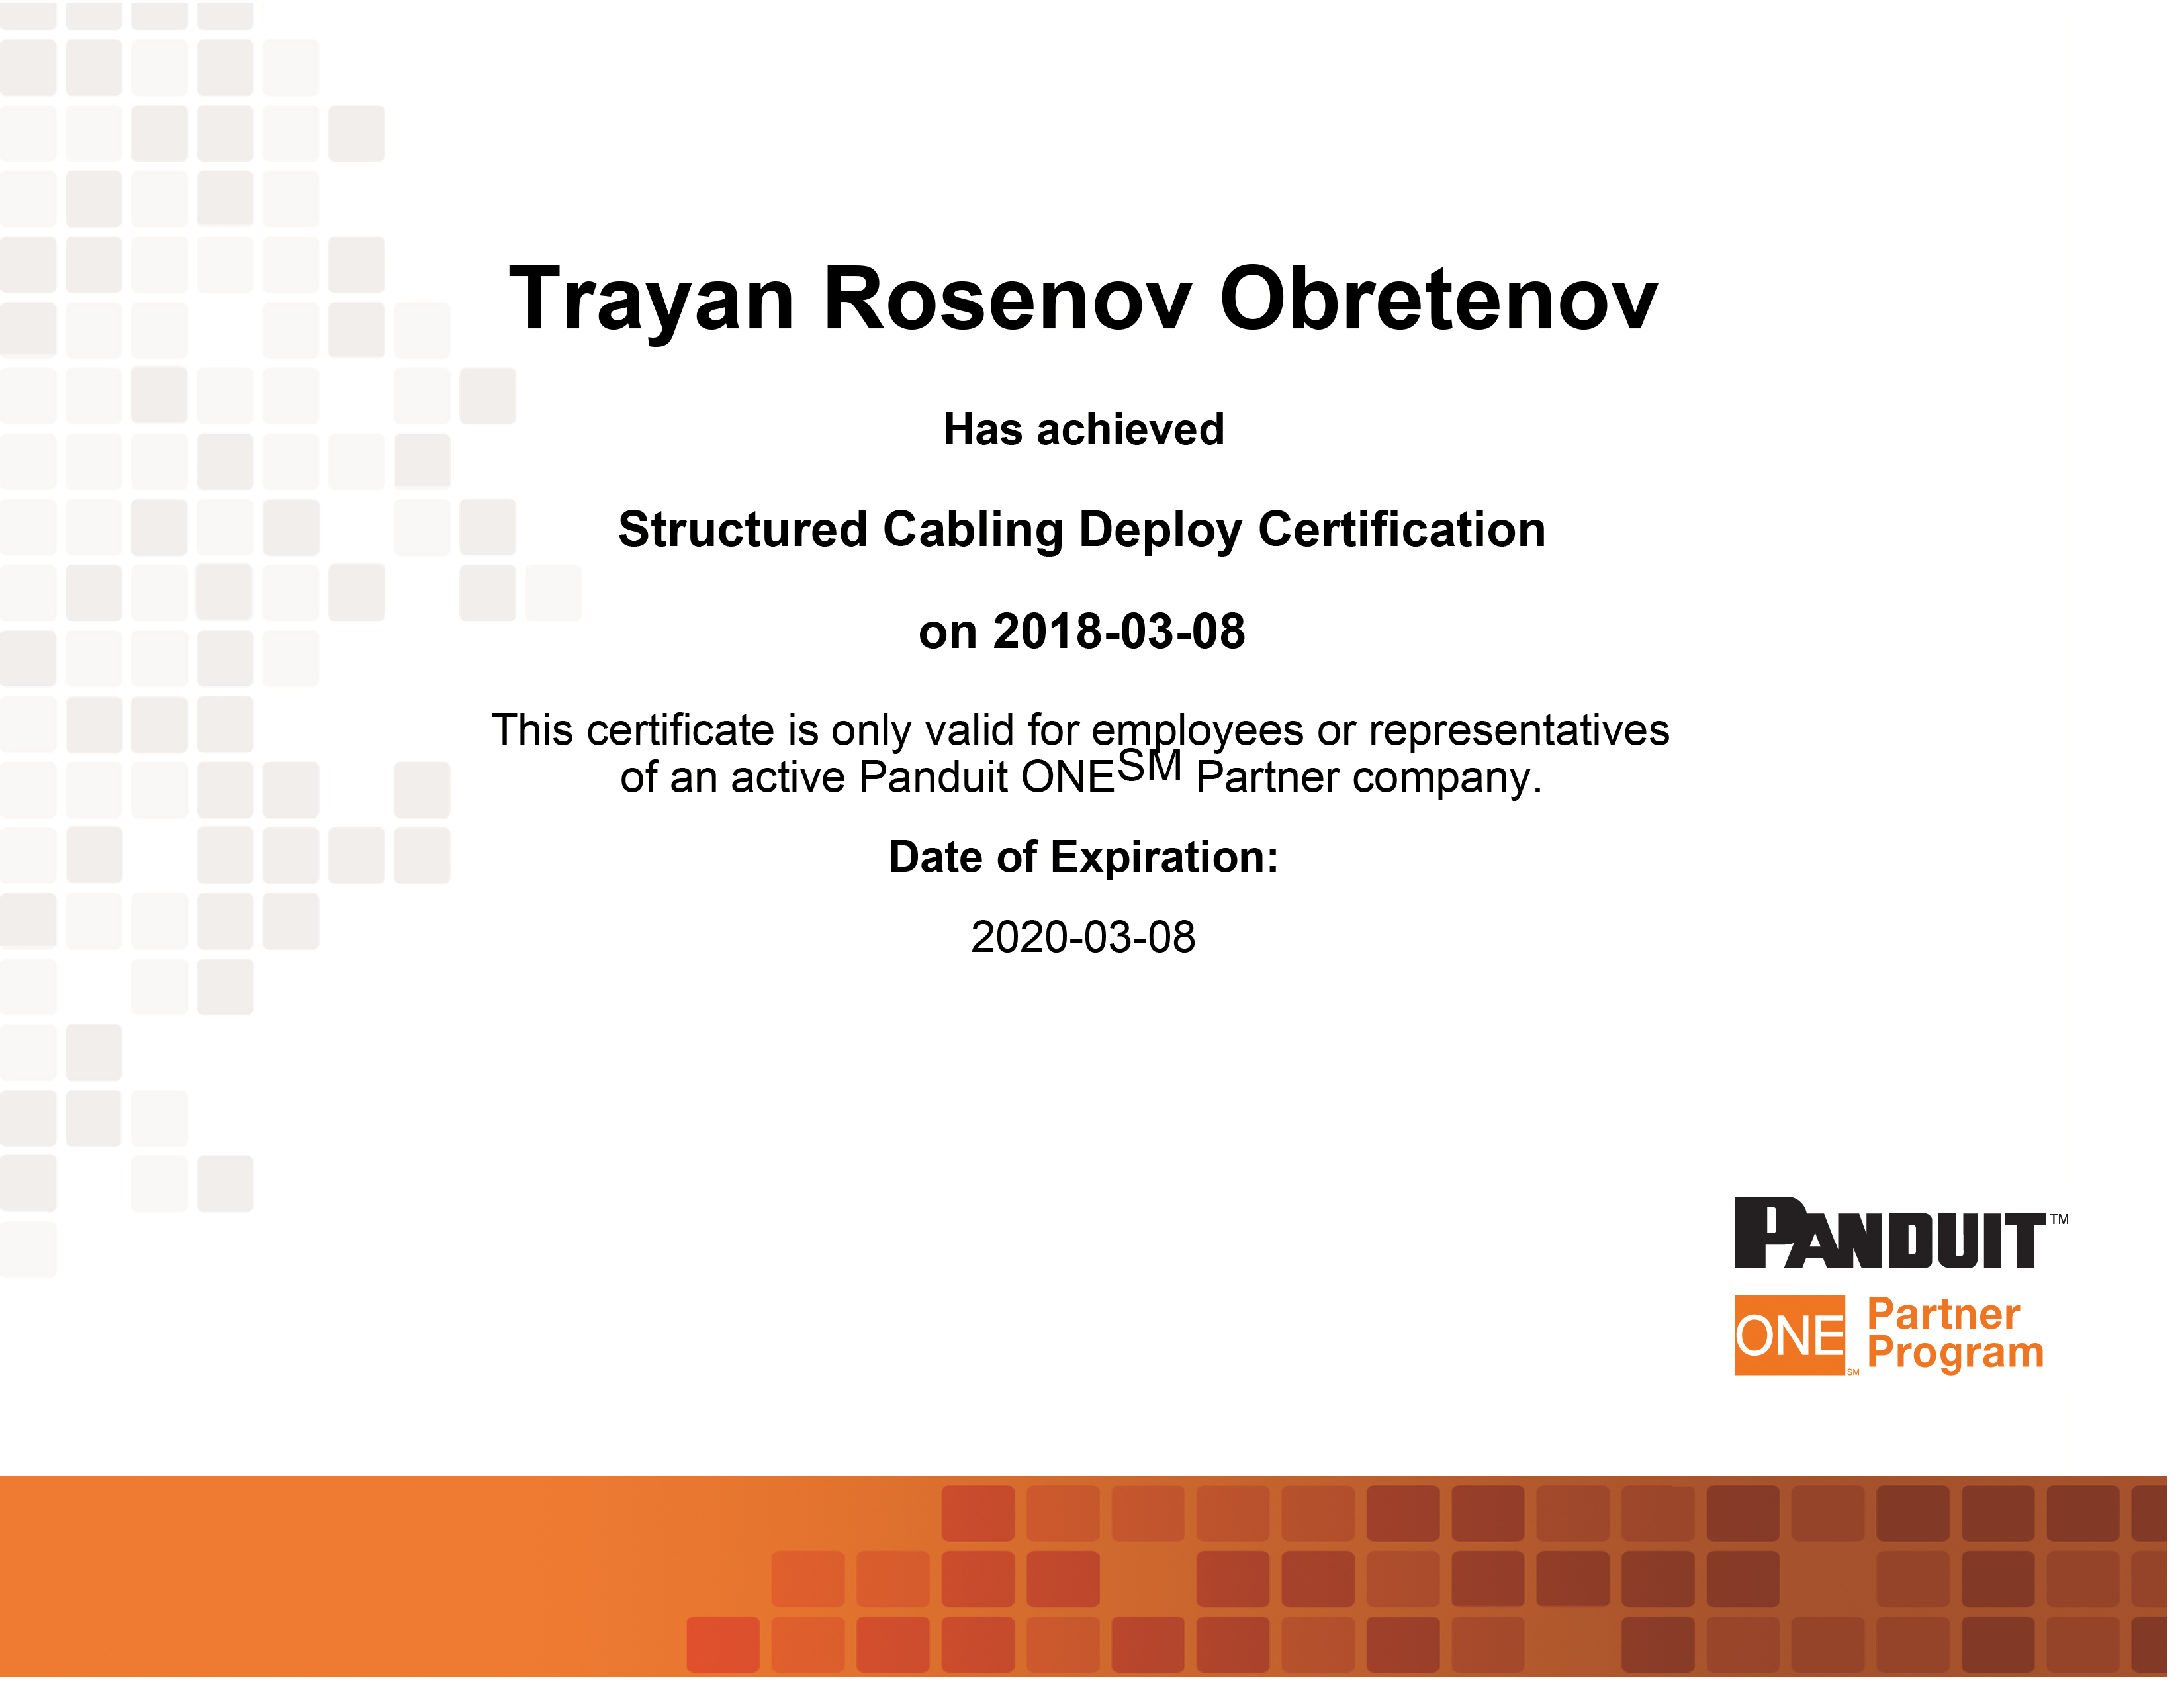 certificate_trayan